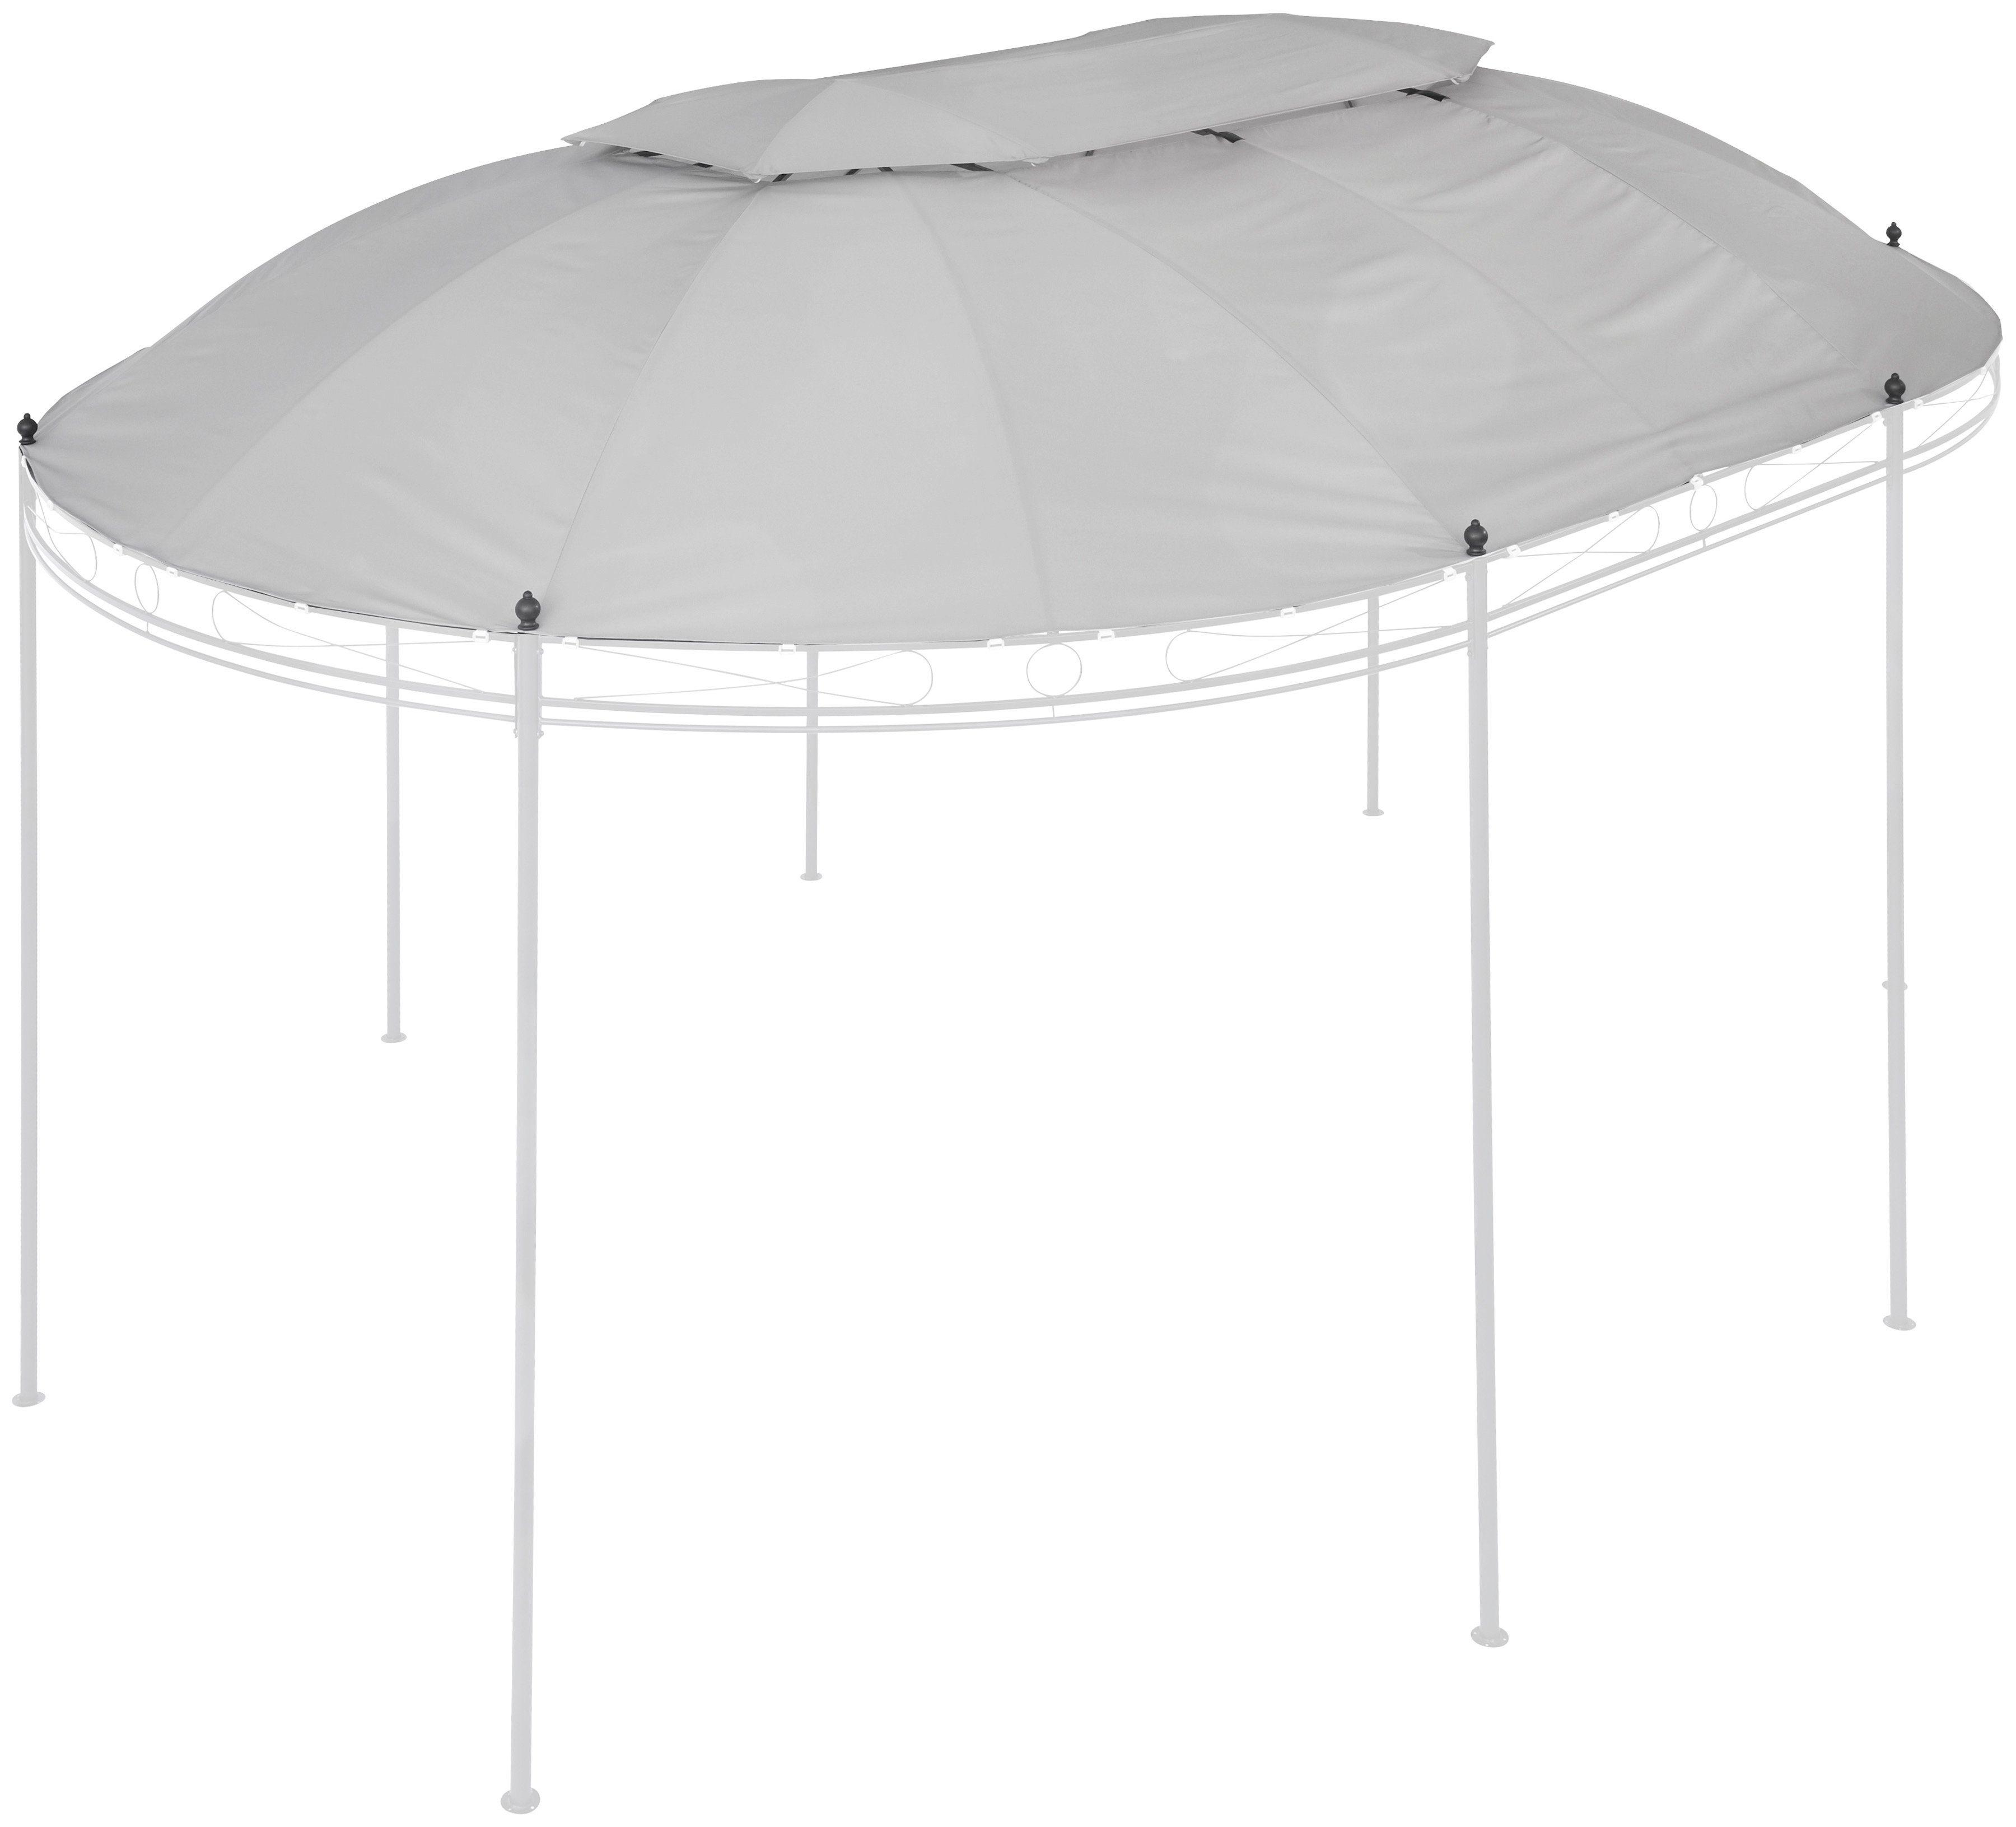 KONIFERA Ersatzdach für Pavillon »Oval«, BxL: 350x500 cm, grau